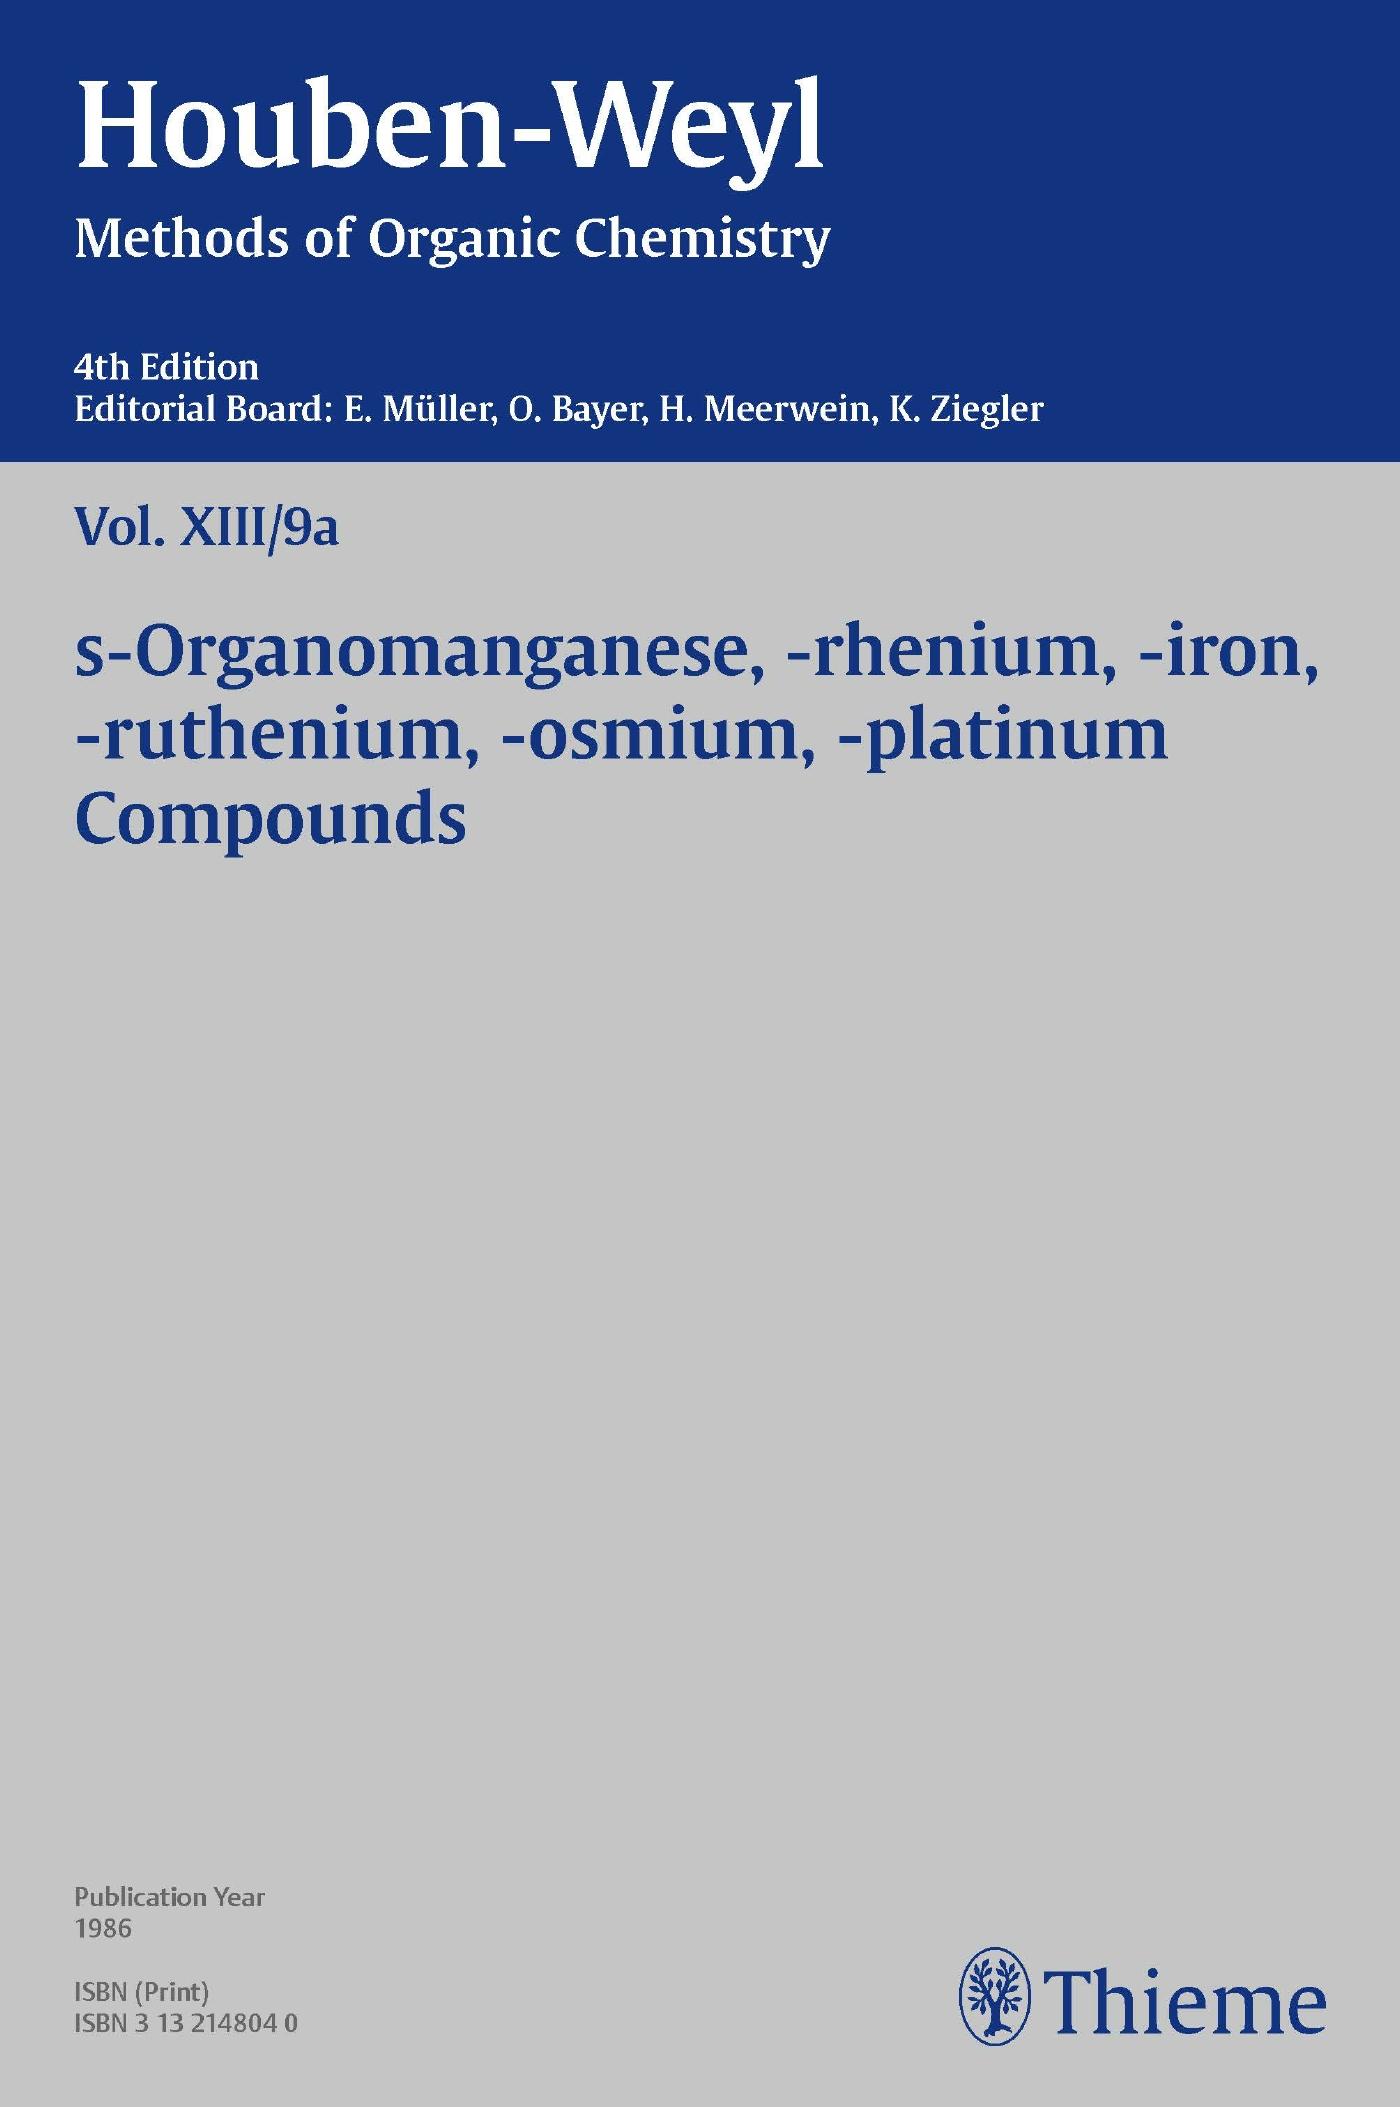 Houben-Weyl Methods of Organic Chemistry Vol. XIII/9a, 4th Edition